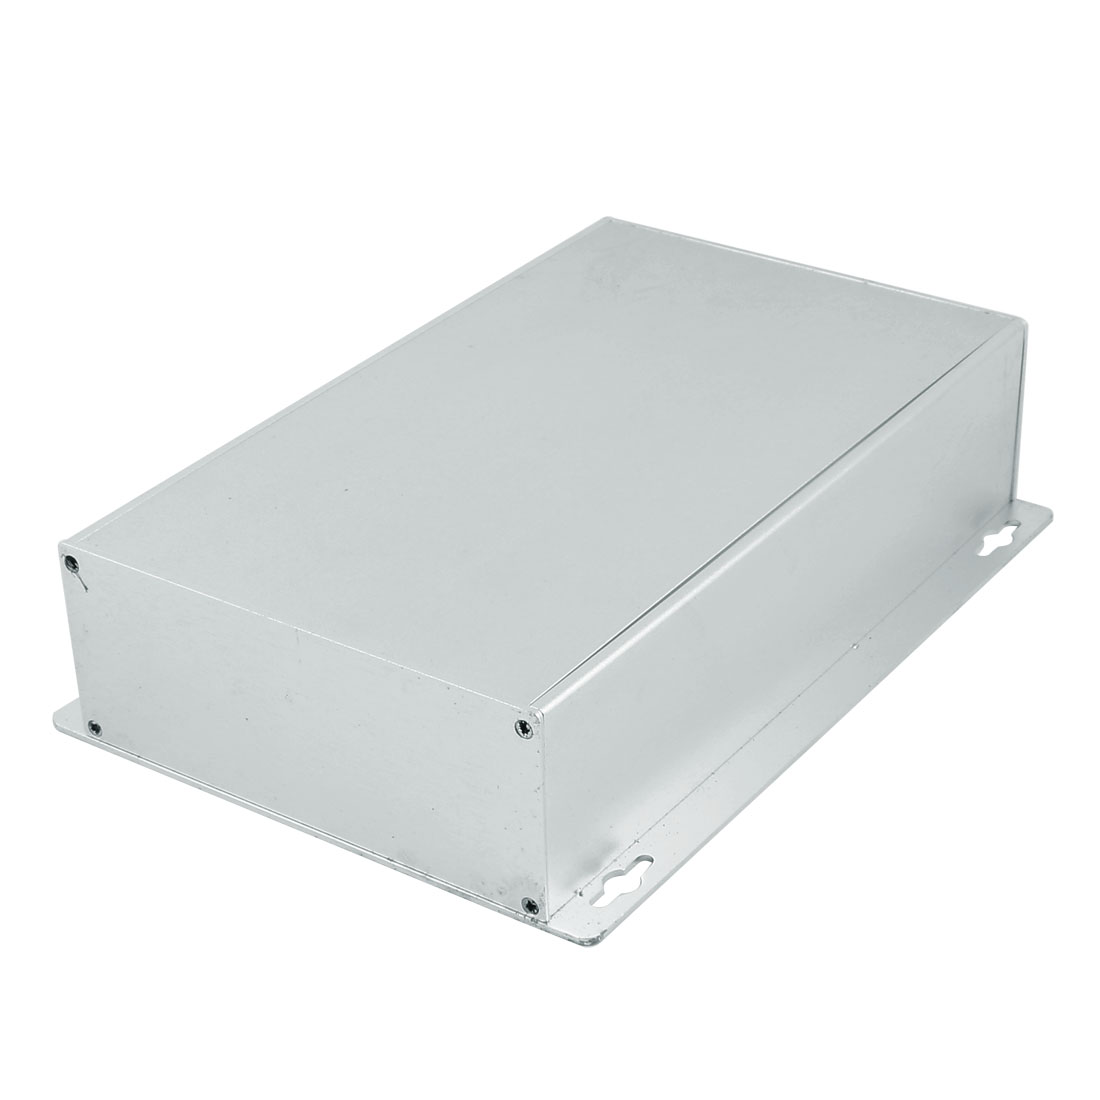 223 x 159 x 55mm Multi-purpose Extruded Aluminum Enclosure Box Silver Tone